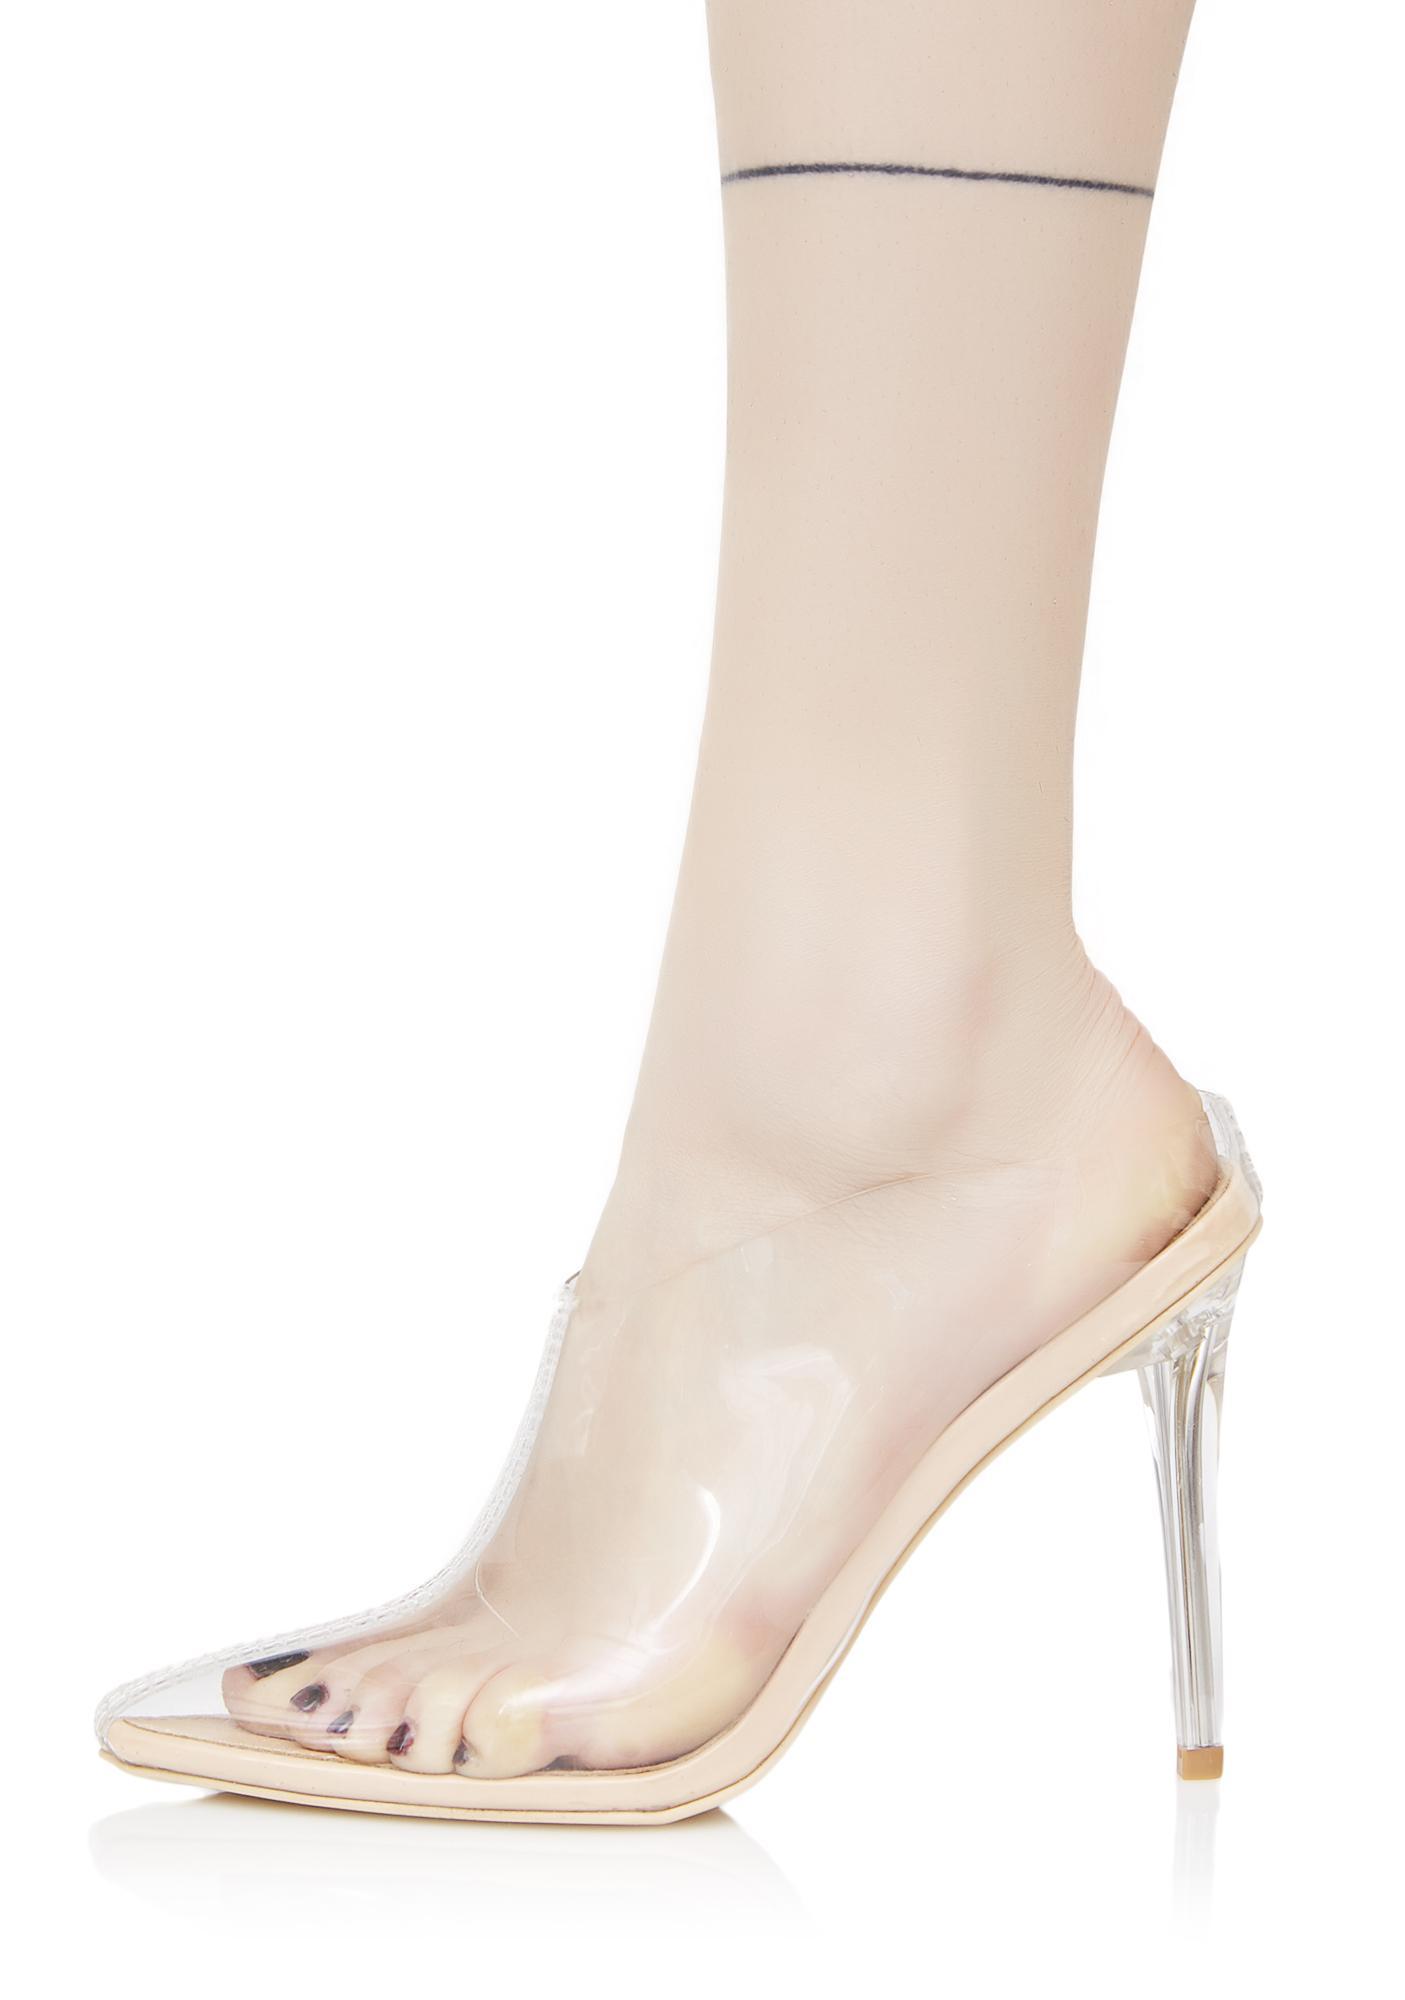 Glass Slipper Clear Heels